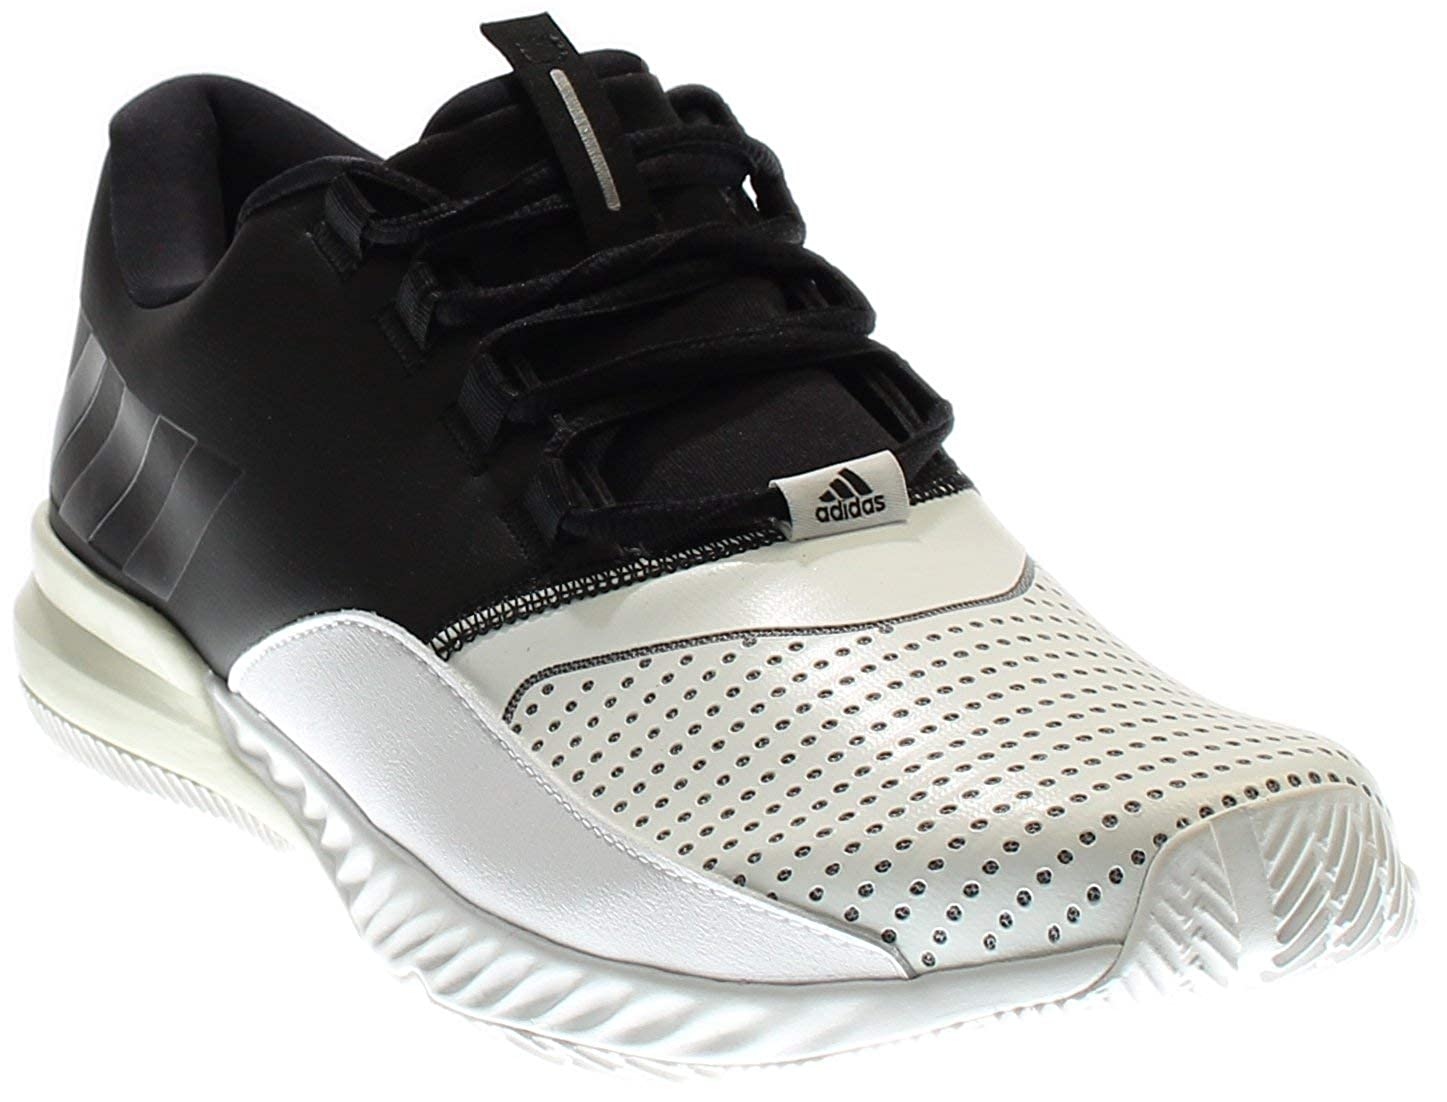 986b48098ebf7 Adidas Crazymove Bounce M Mens cross-trainer-shoes AQ3919 8 - Black ...